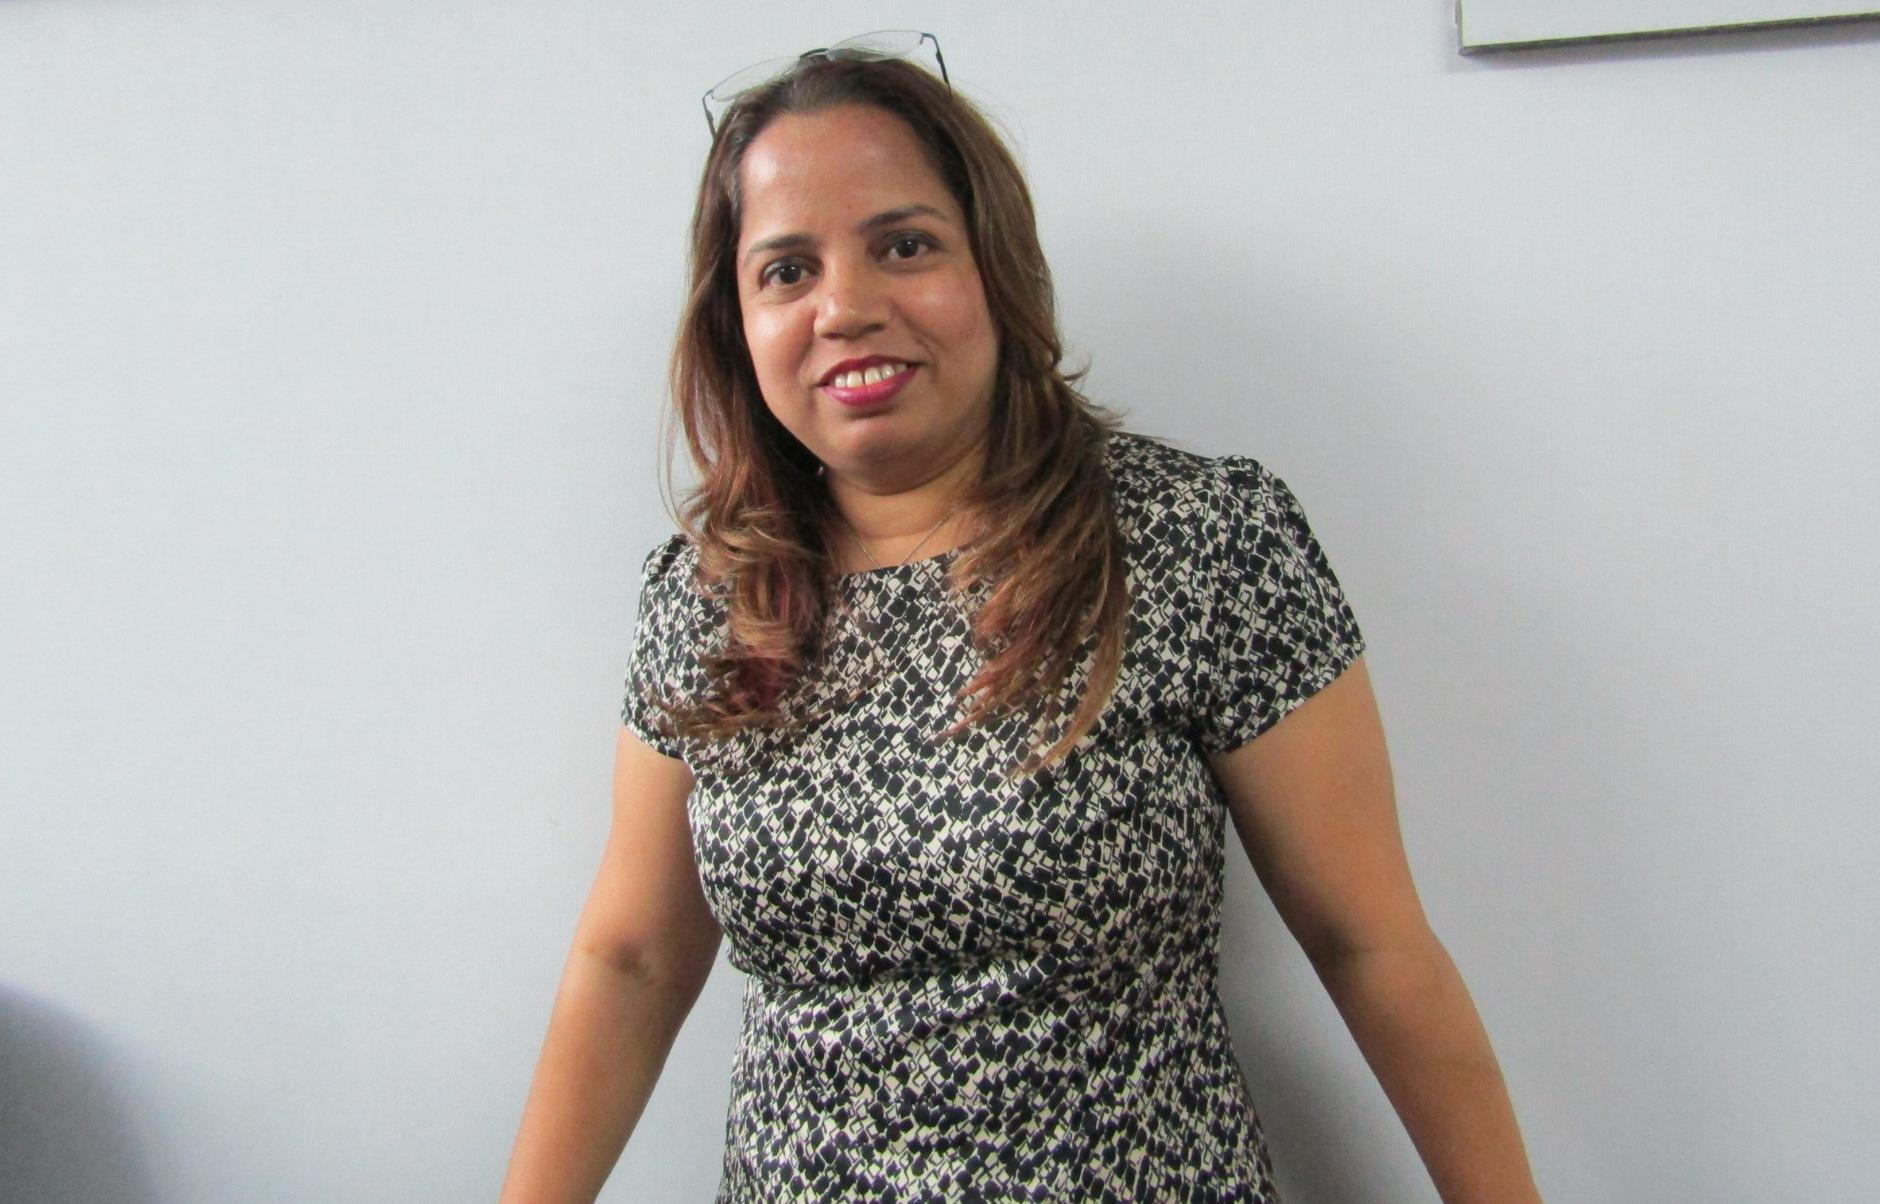 Kavita Javeri, owner of Sparkle Salon and event organizer